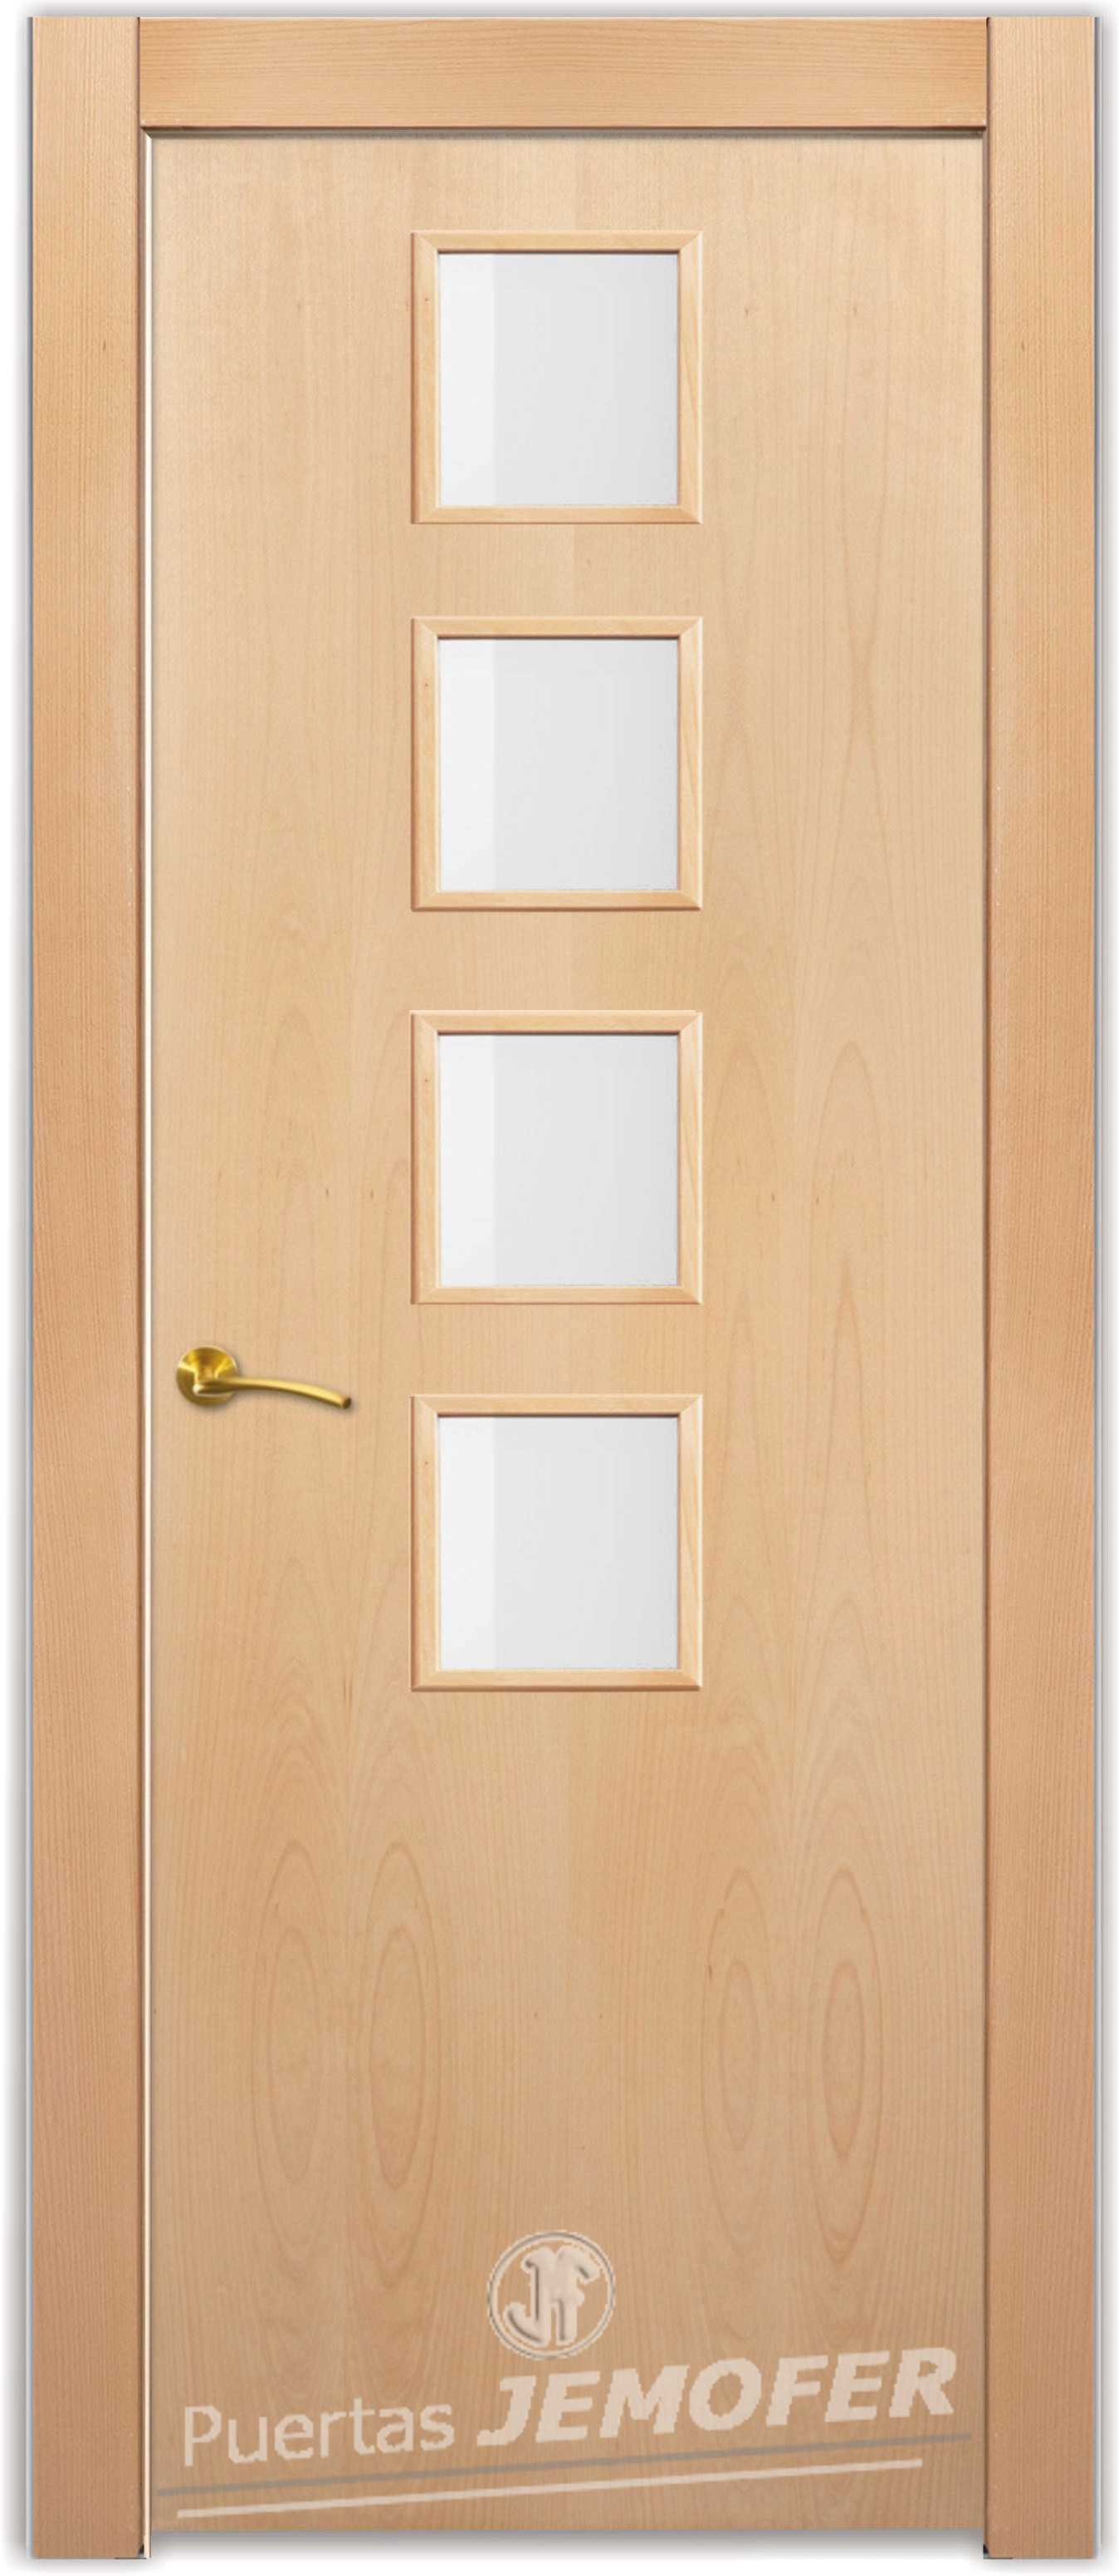 Puerta interior moderna l1 4vc puertas jemofer - Puertas de madera interiores precios ...